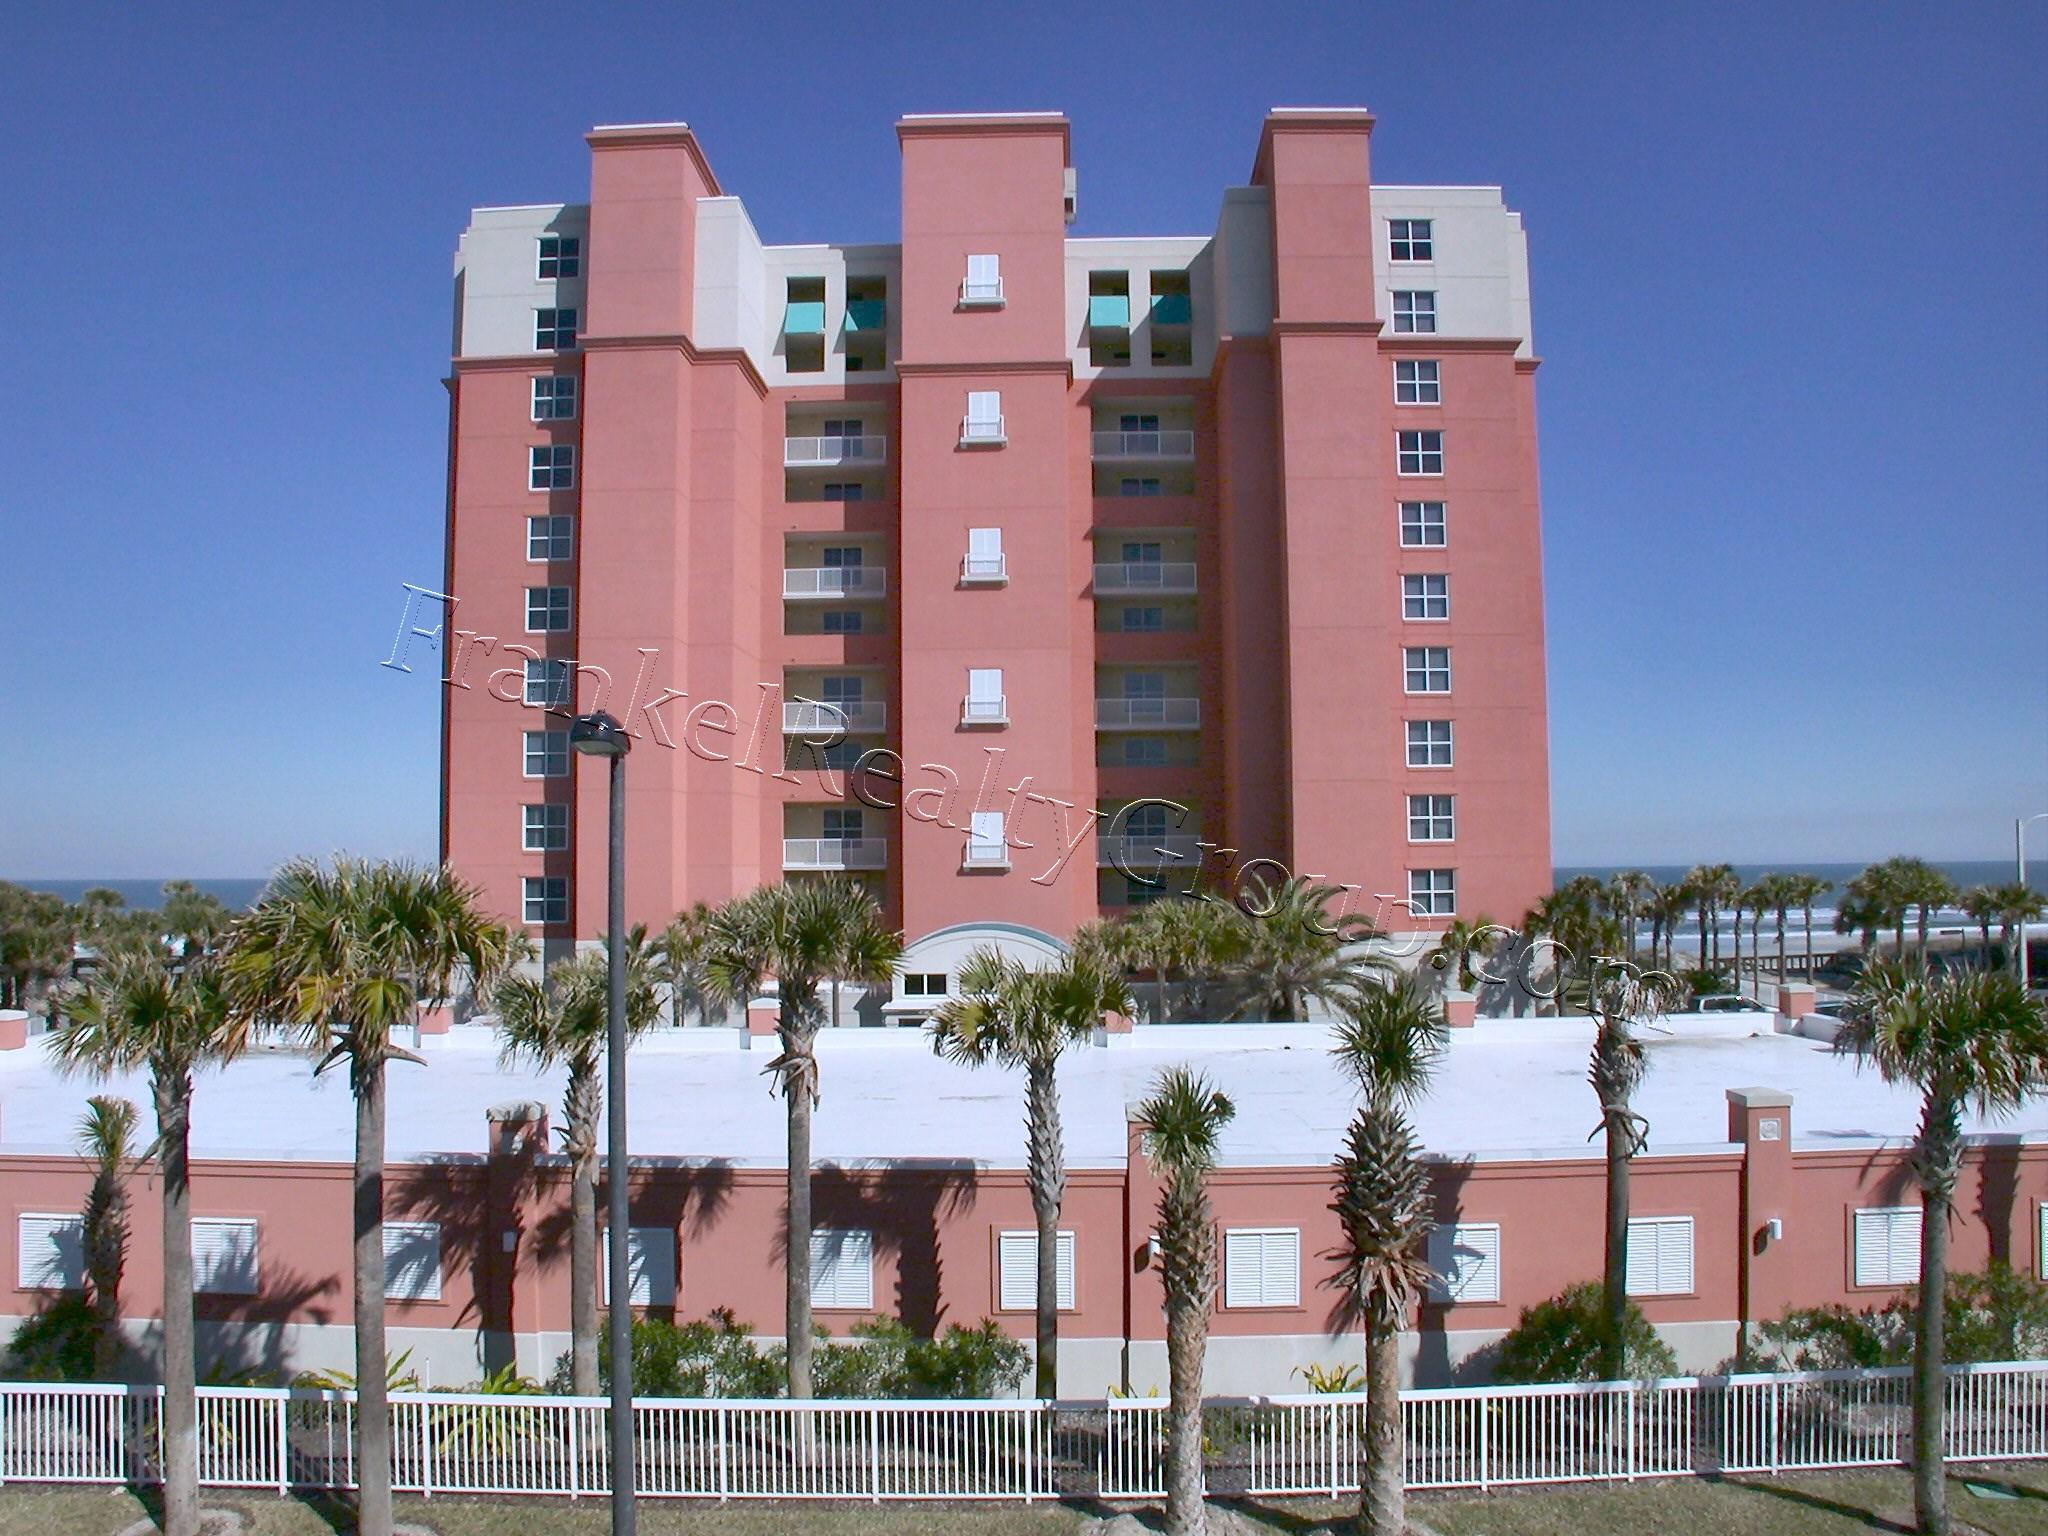 Oceania Jacksonville Beach Oceanfront Condos For Sale